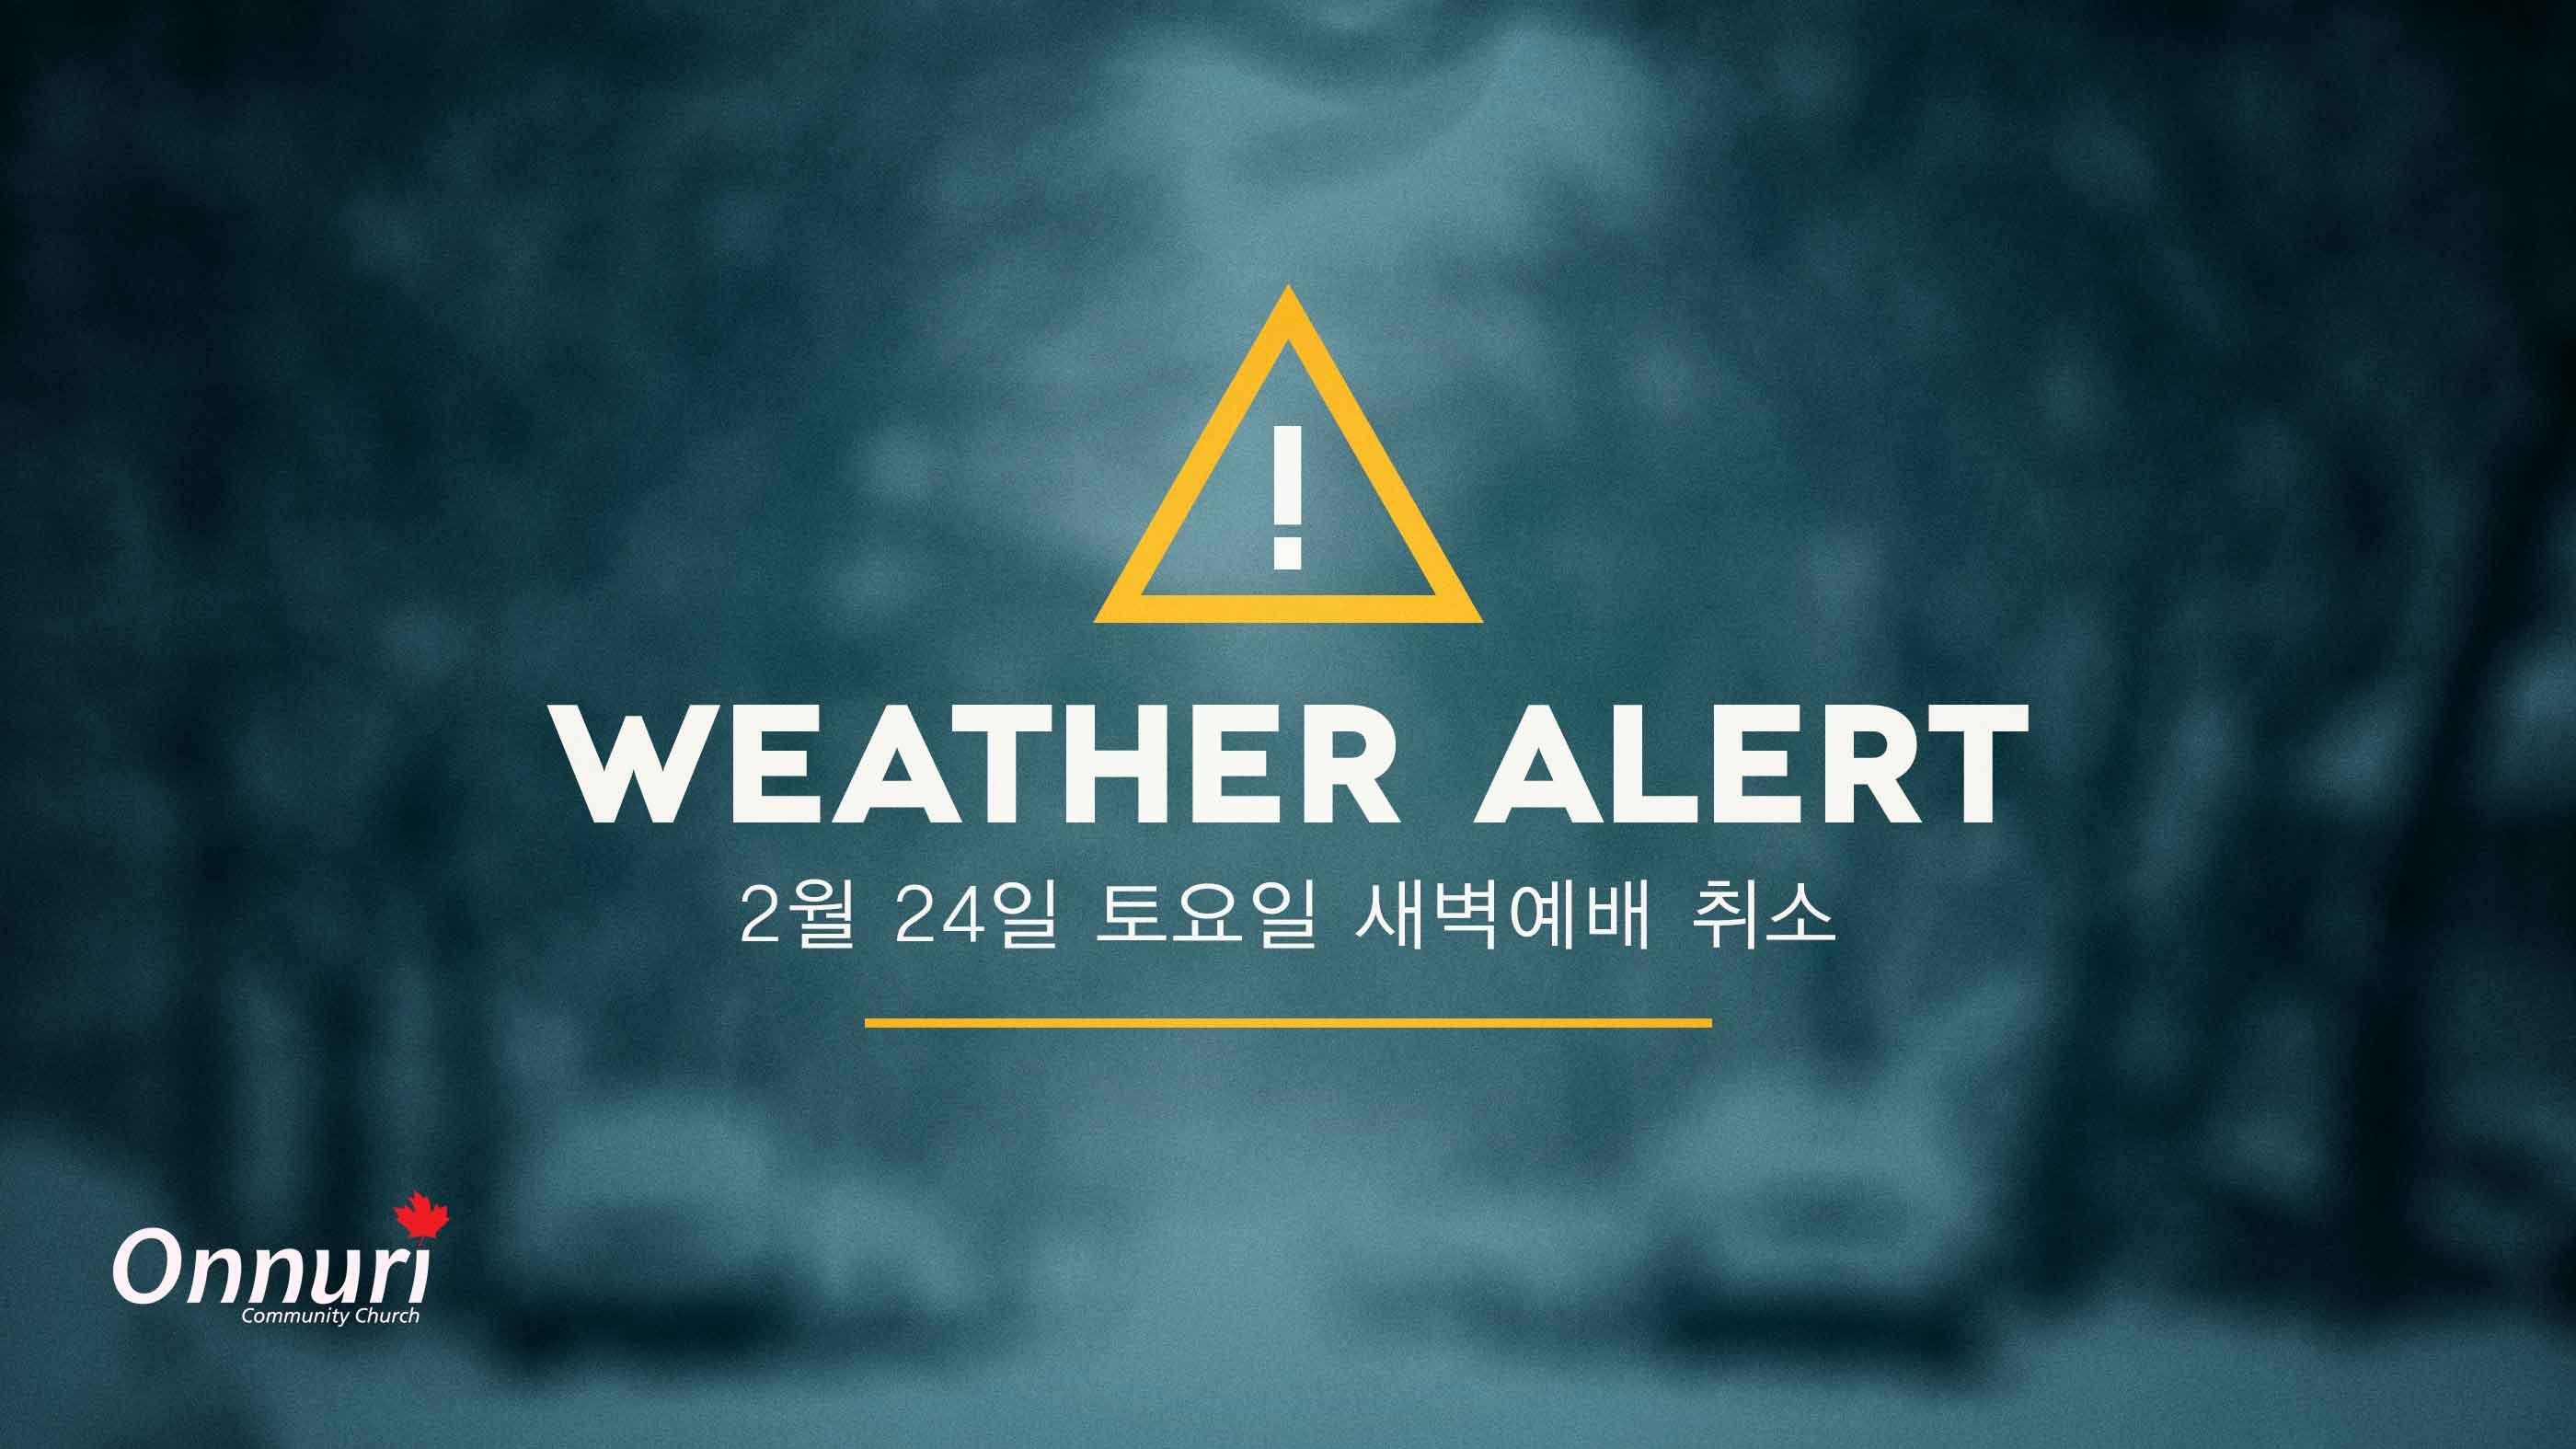 20180224-weather_alert-still-PSD